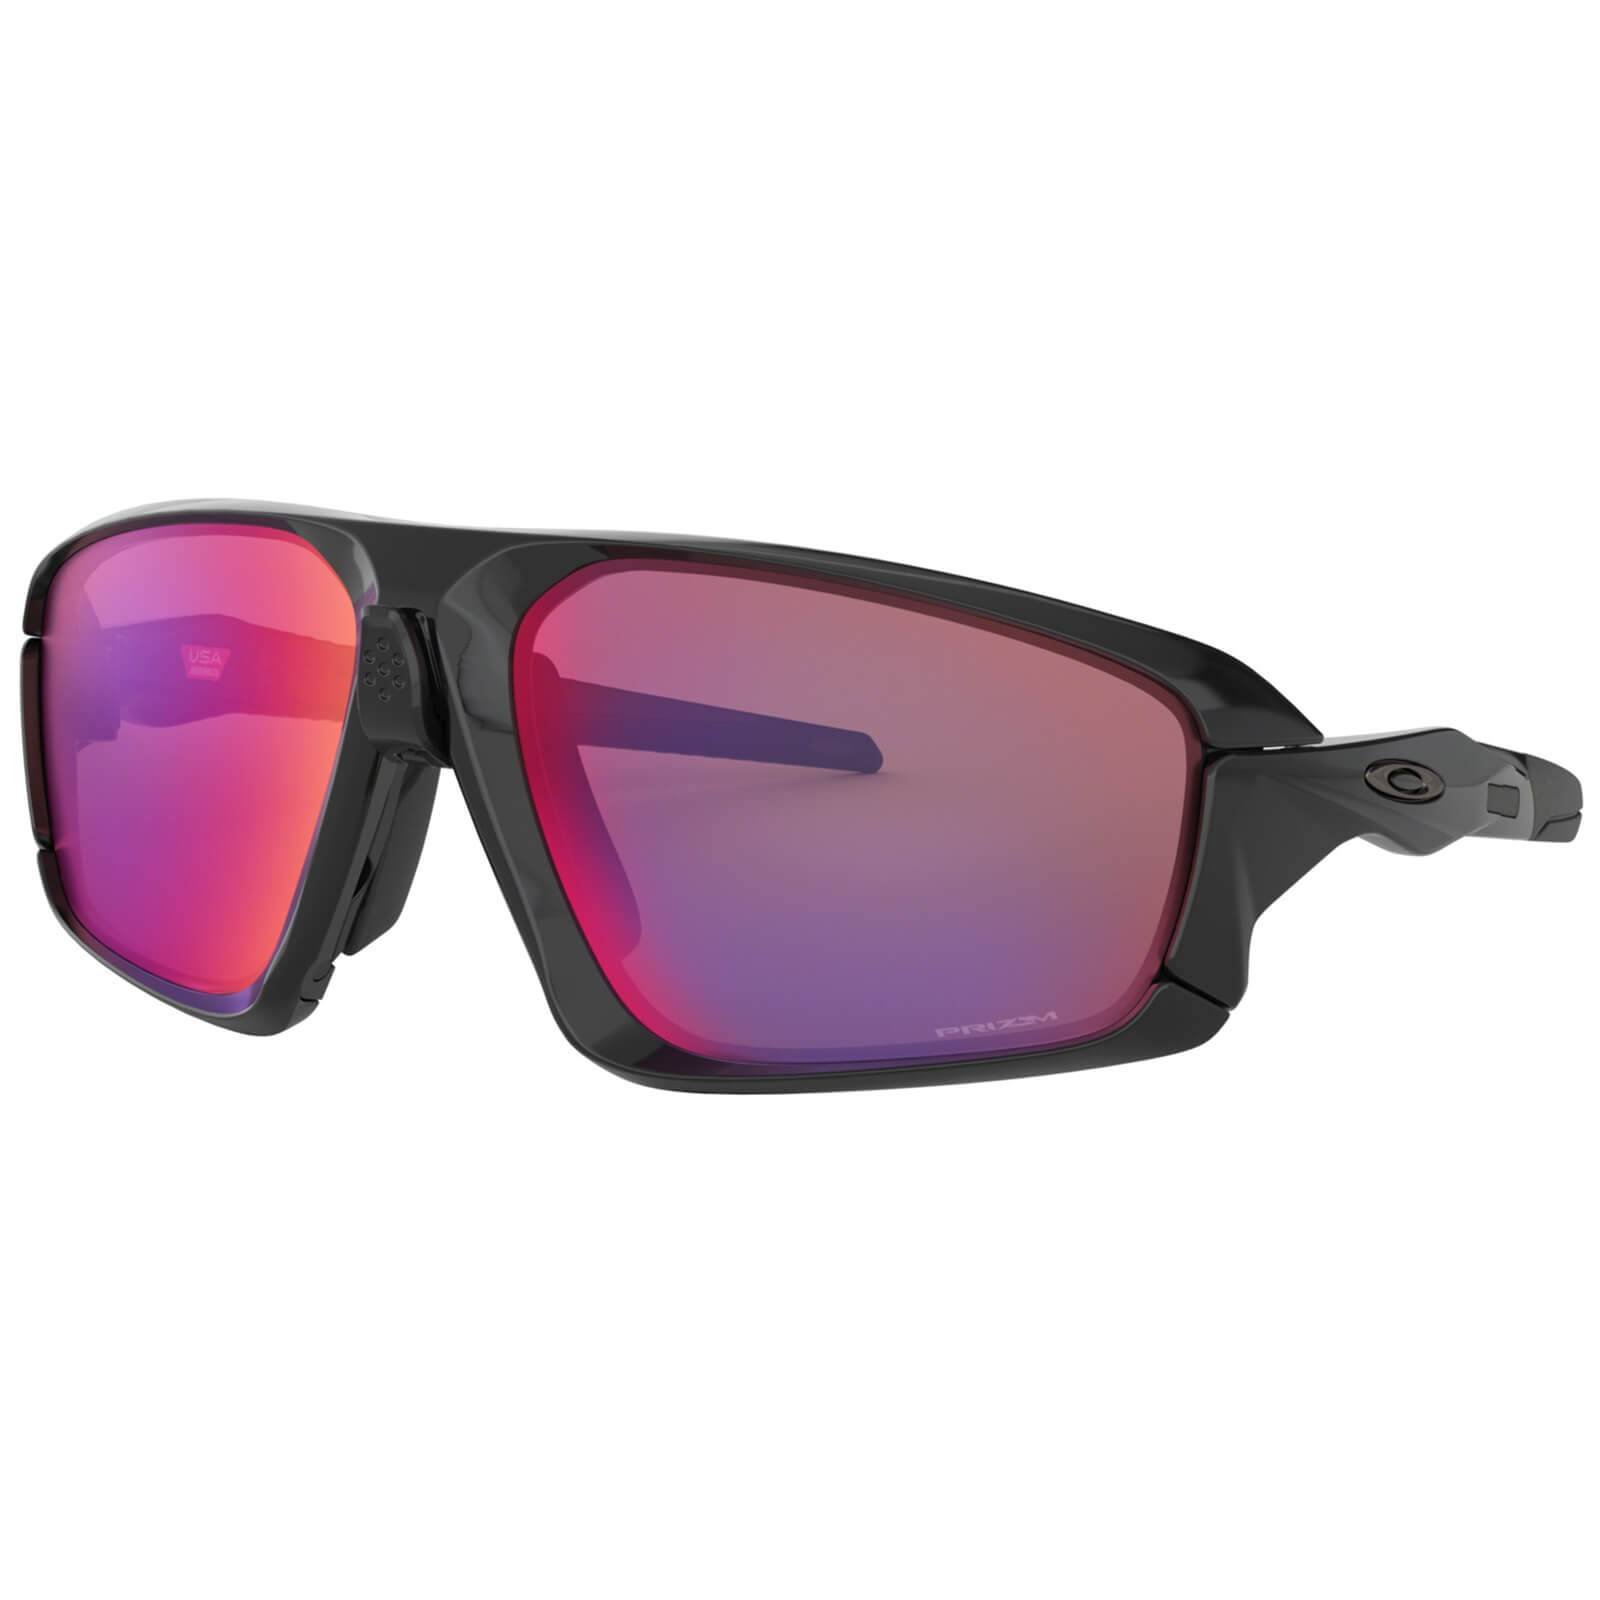 Oakley Field Jacket Sunglasses - Polished Black/Prizm Road